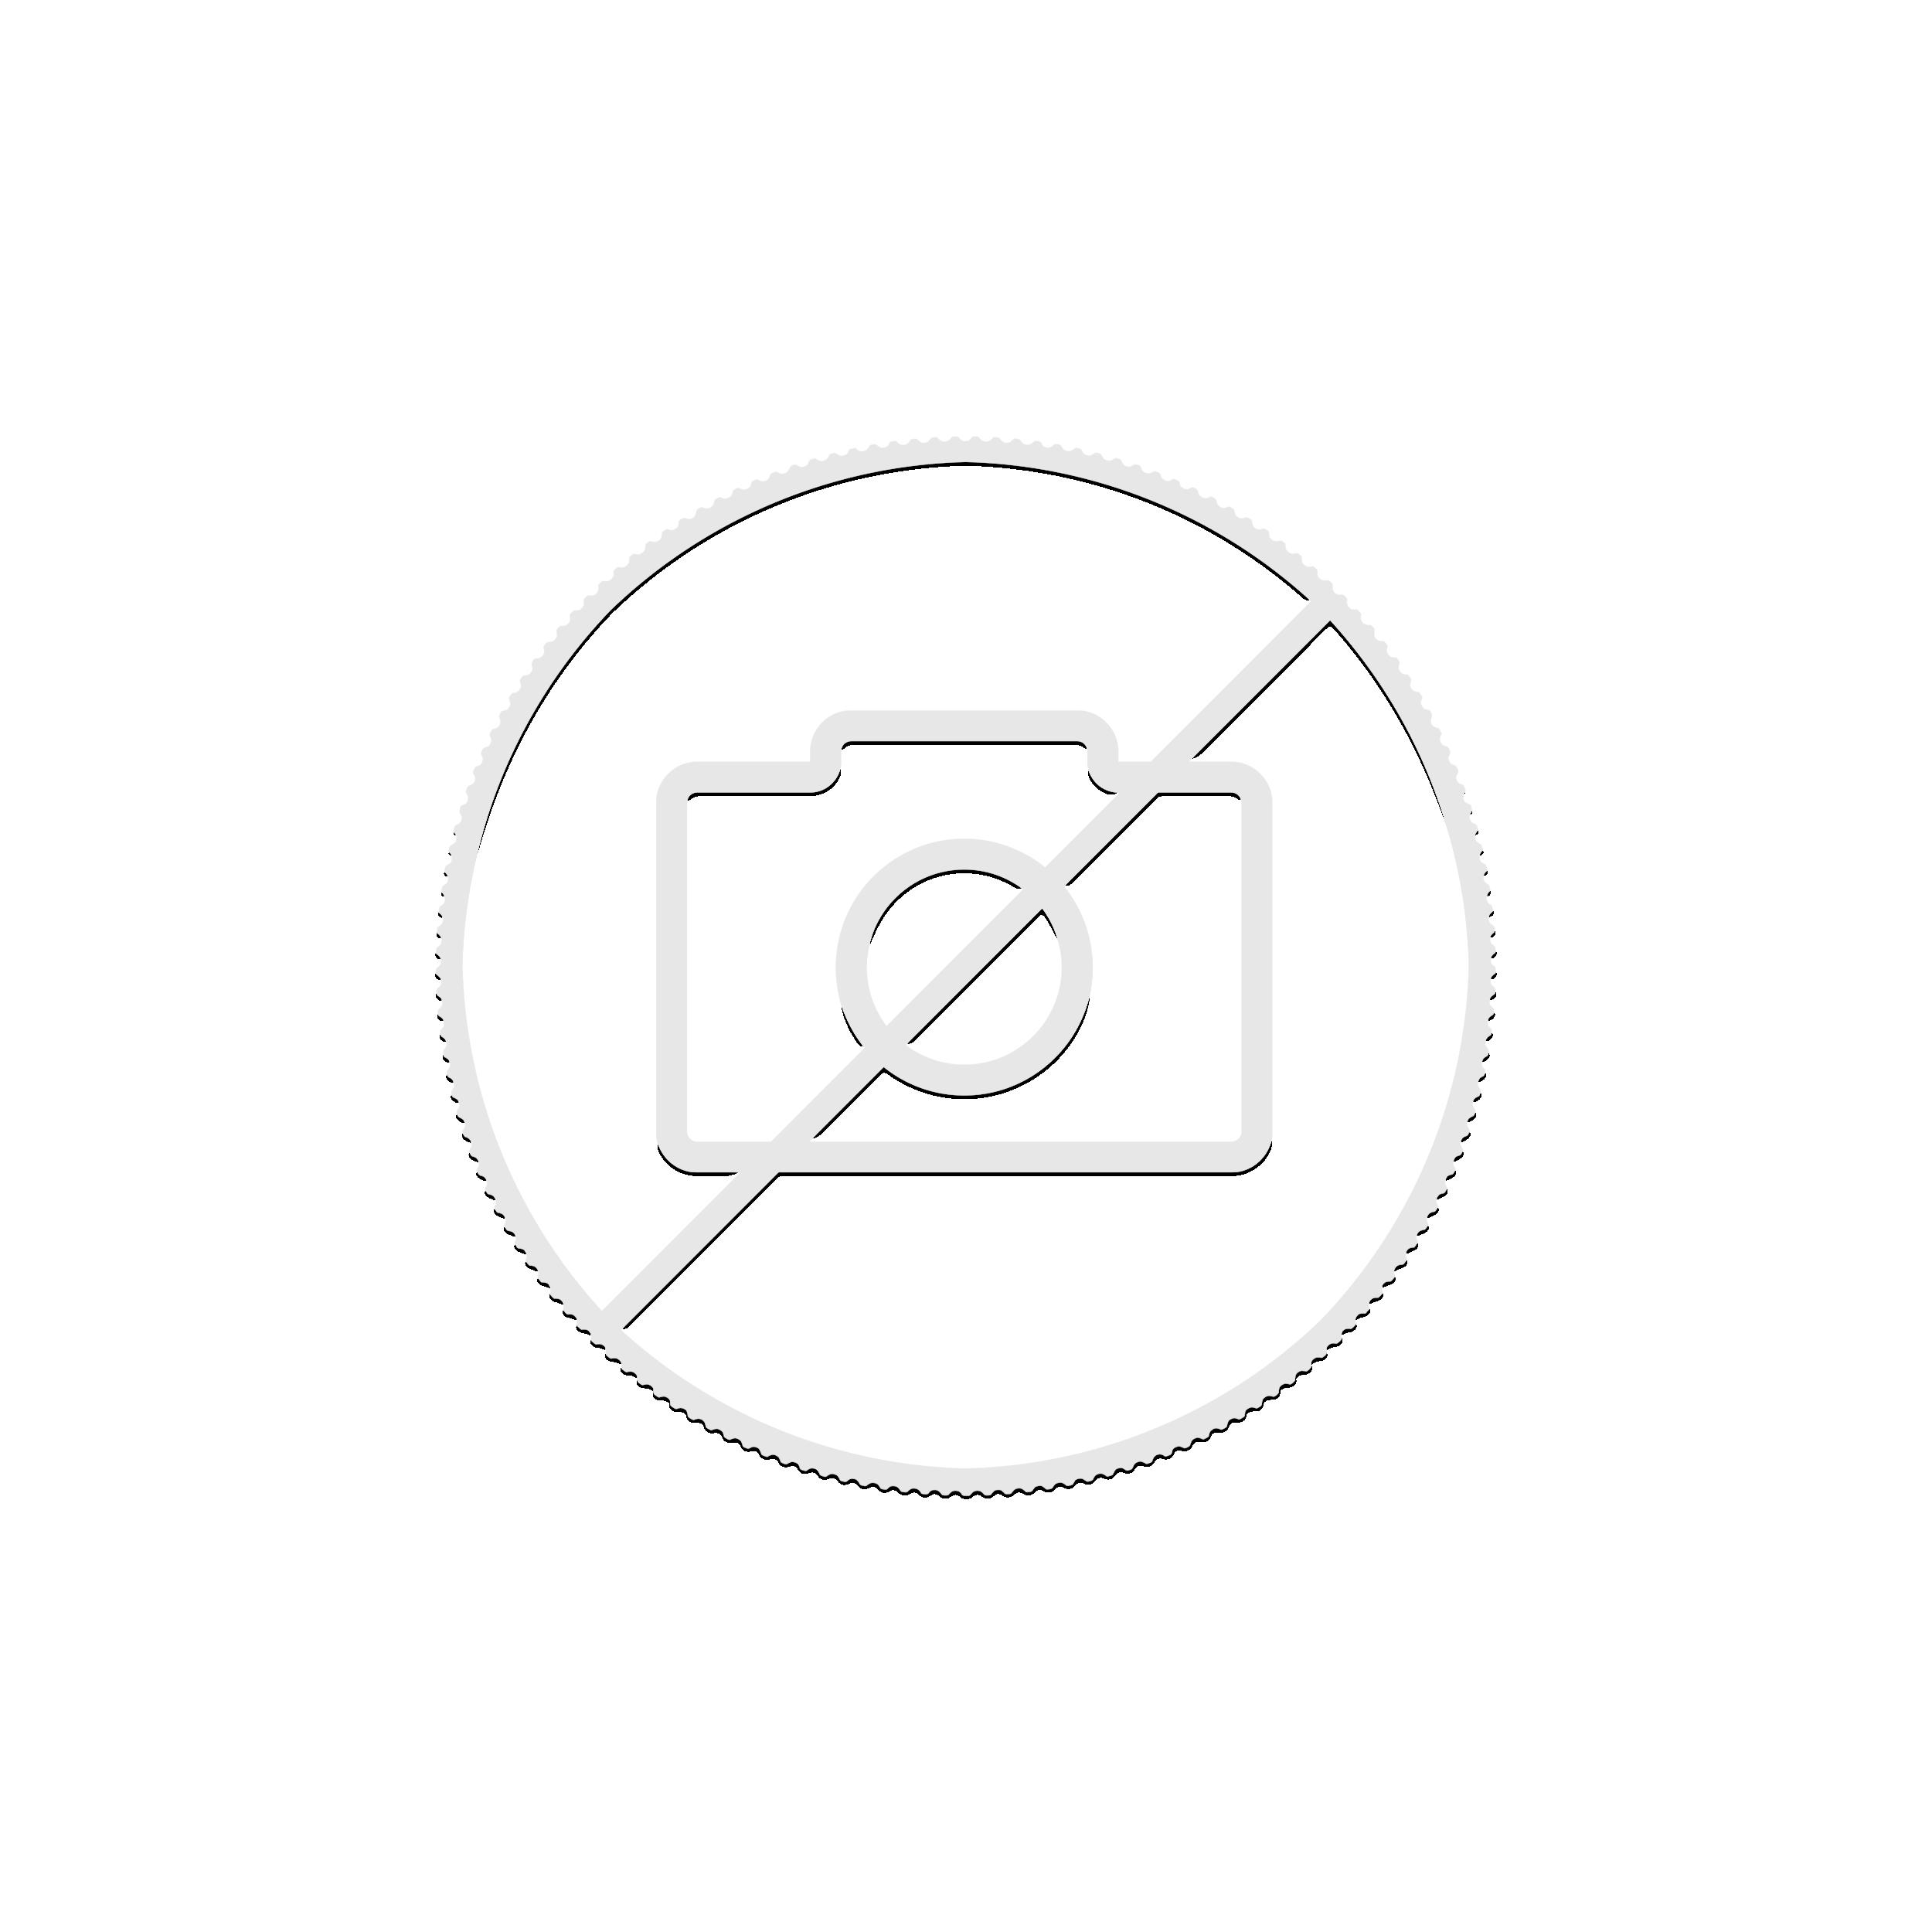 1/2 troy ounce goud Lunar munt 2012 - jaar van de draak